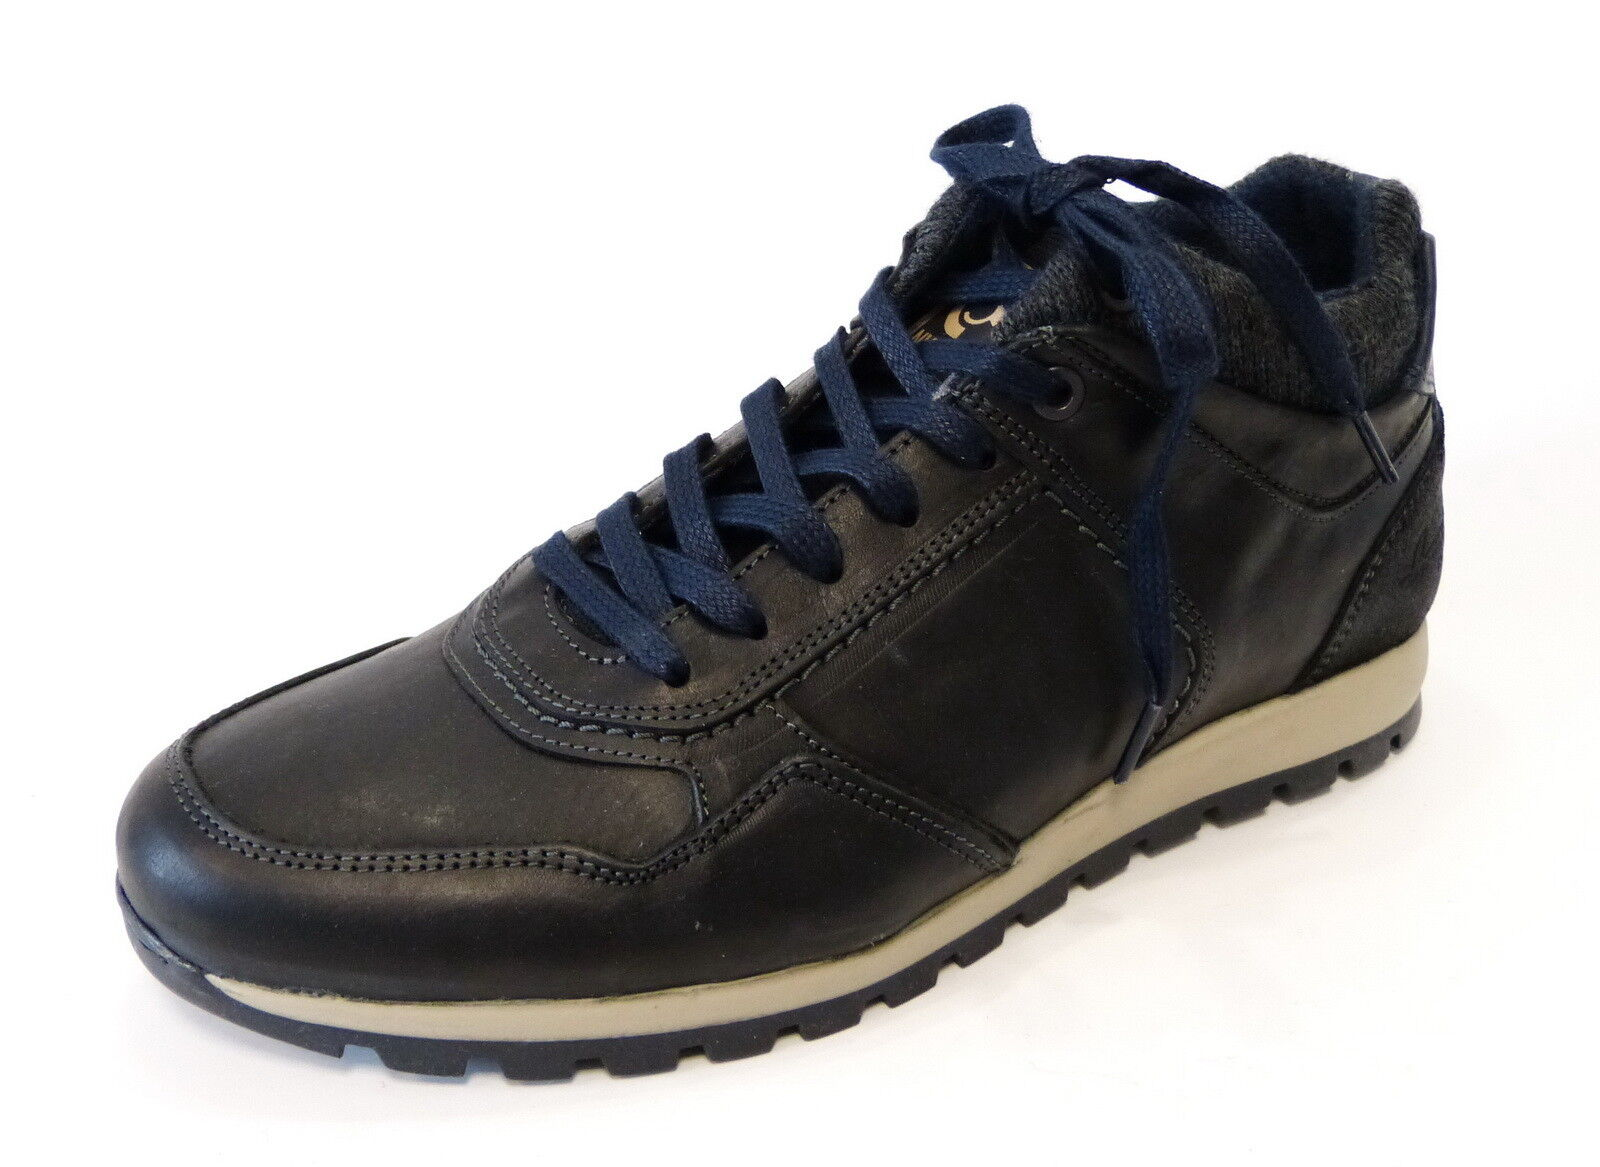 Bullboxer sportlicher Trend Sneaker schwarz Hi Top 628K56306Ap737 Leder